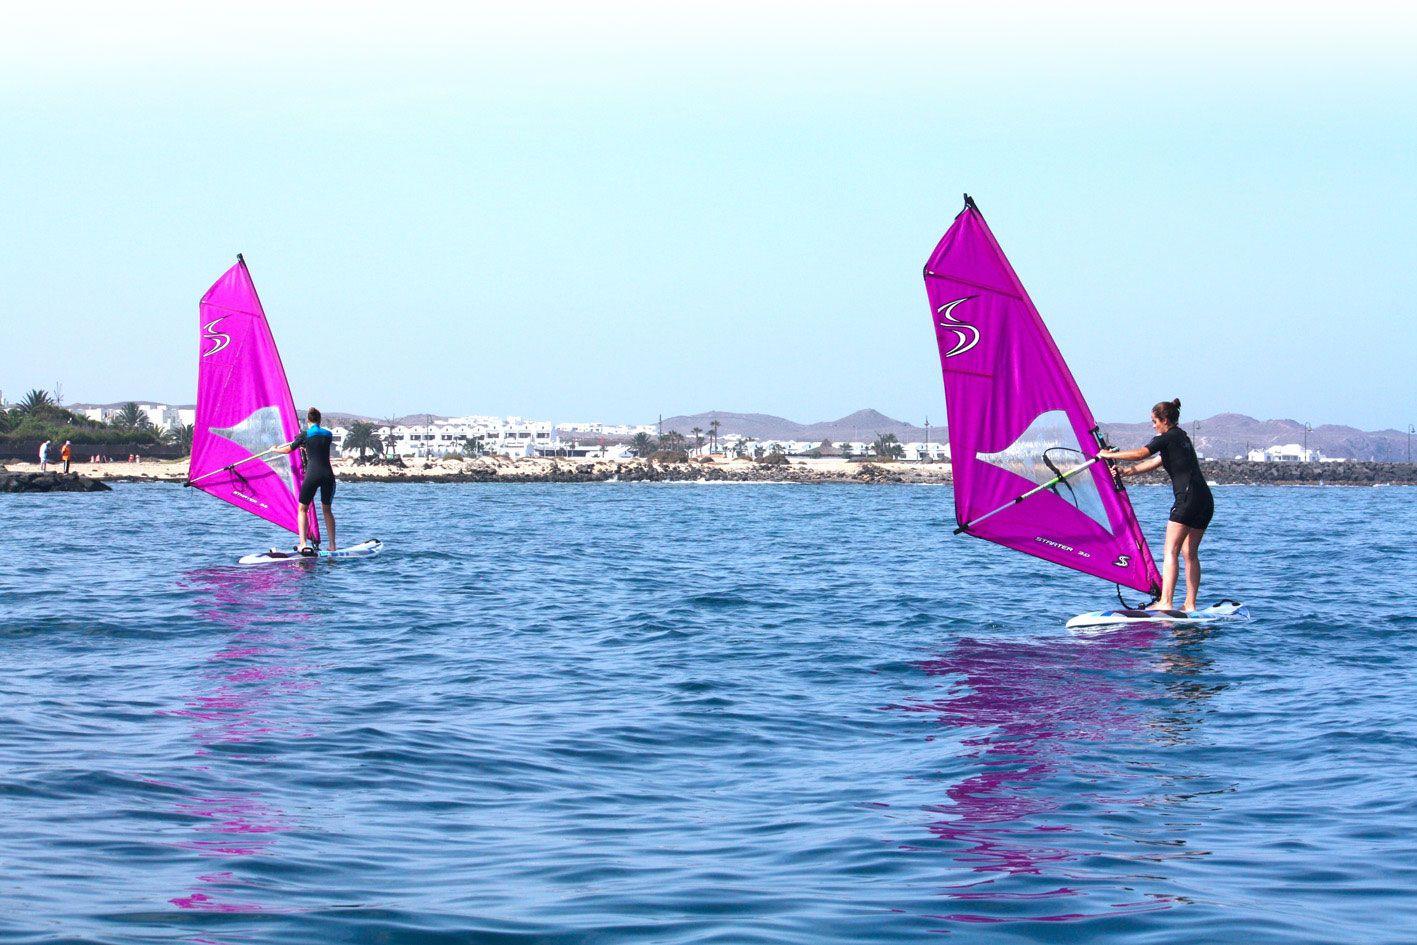 Lanzarote windsurfing